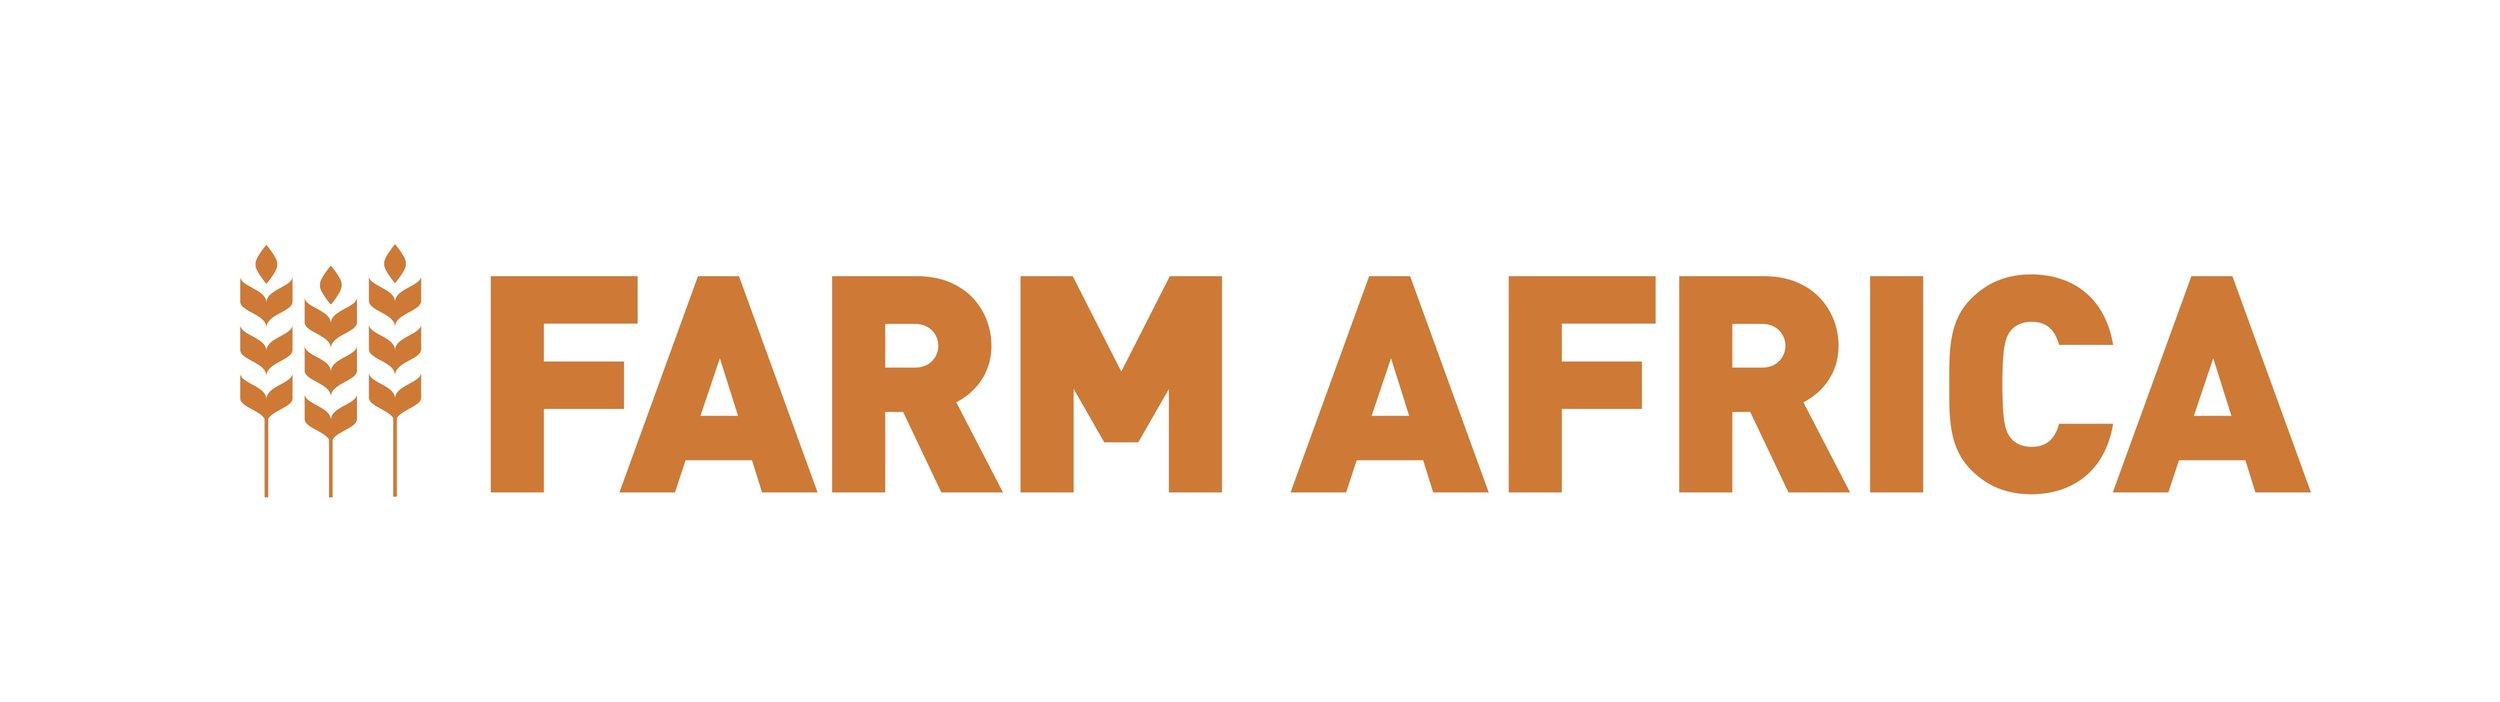 Farm Africa logo-orange.jpg